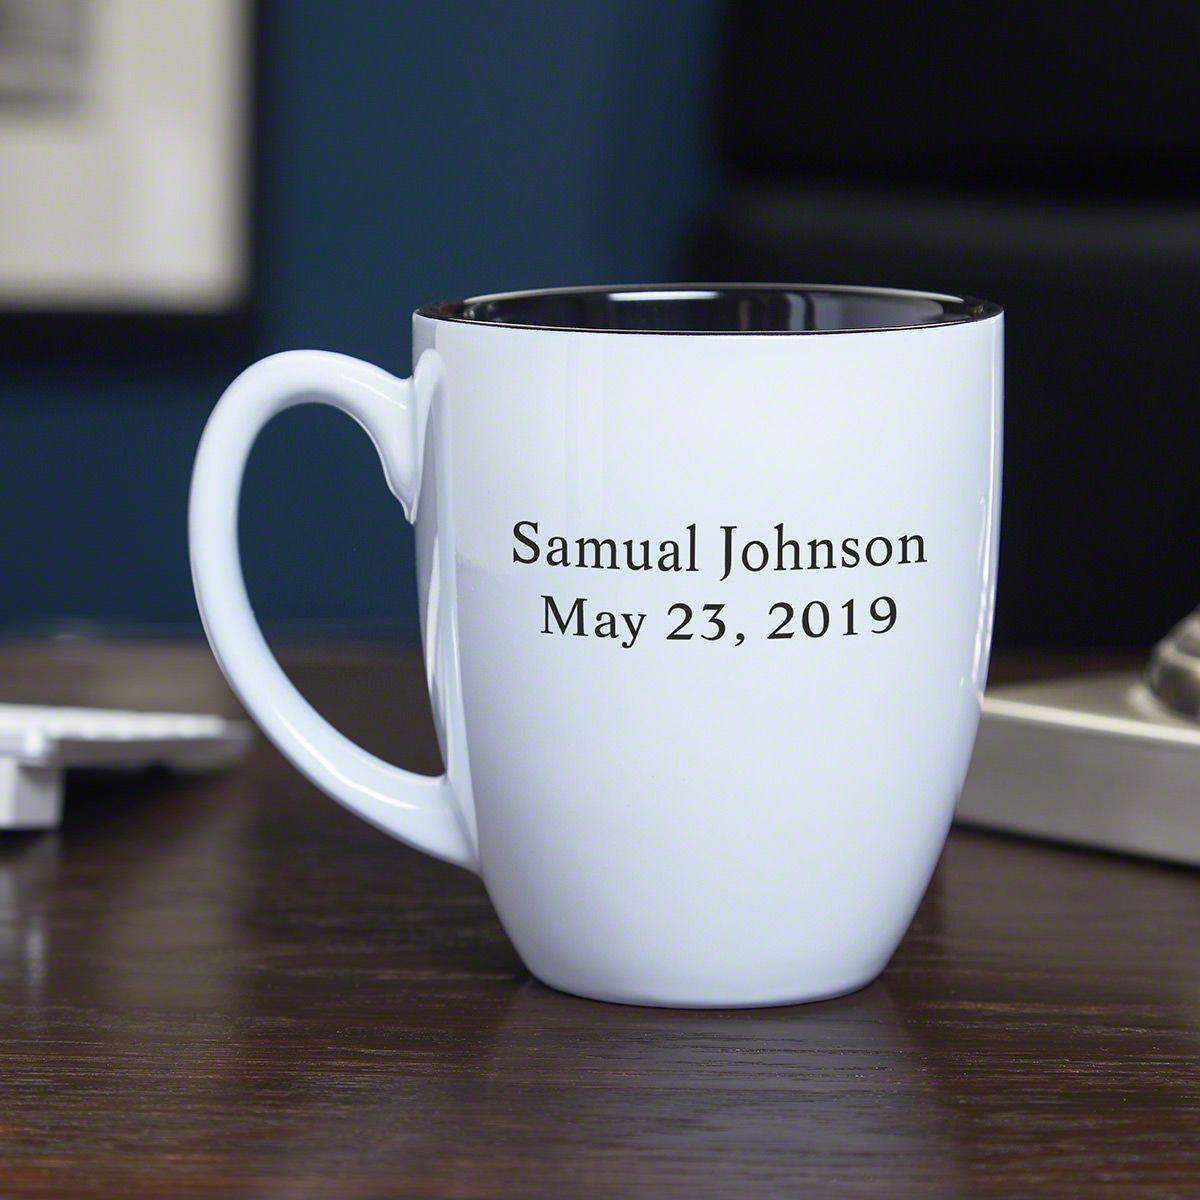 Personalized Coffee Mug, White